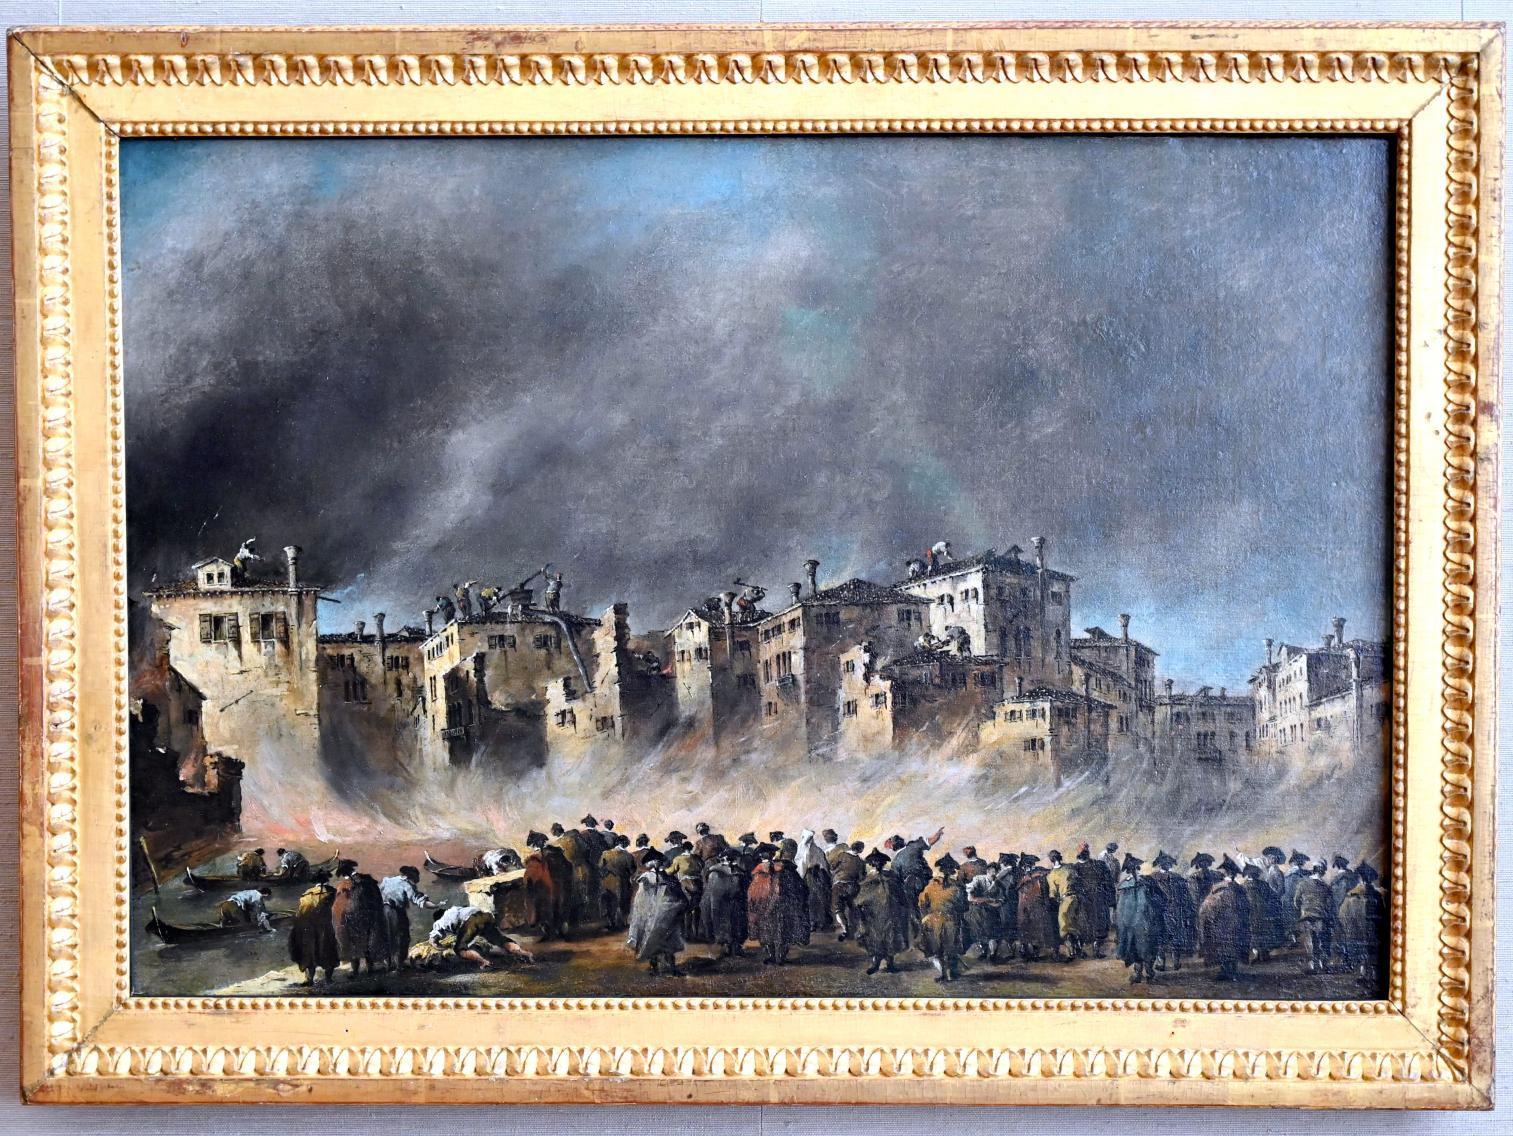 Francesco Guardi: Der Brand im Quartier von San Marcuola, Um 1790